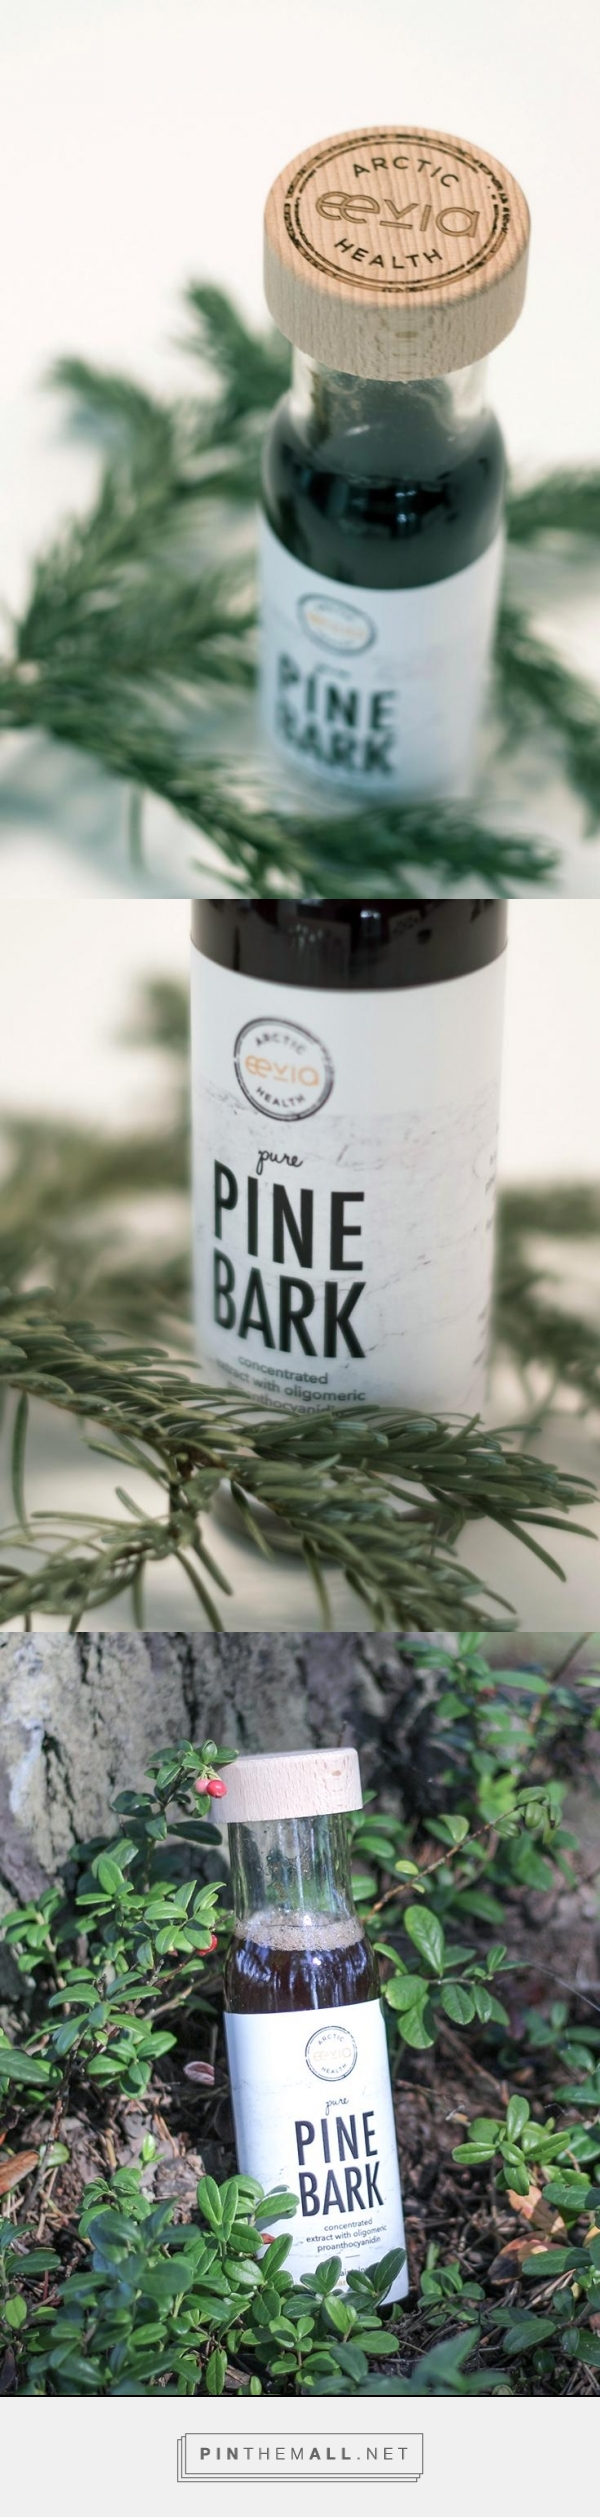 Packaging design - organic & healthy pine bark drink from Eevia